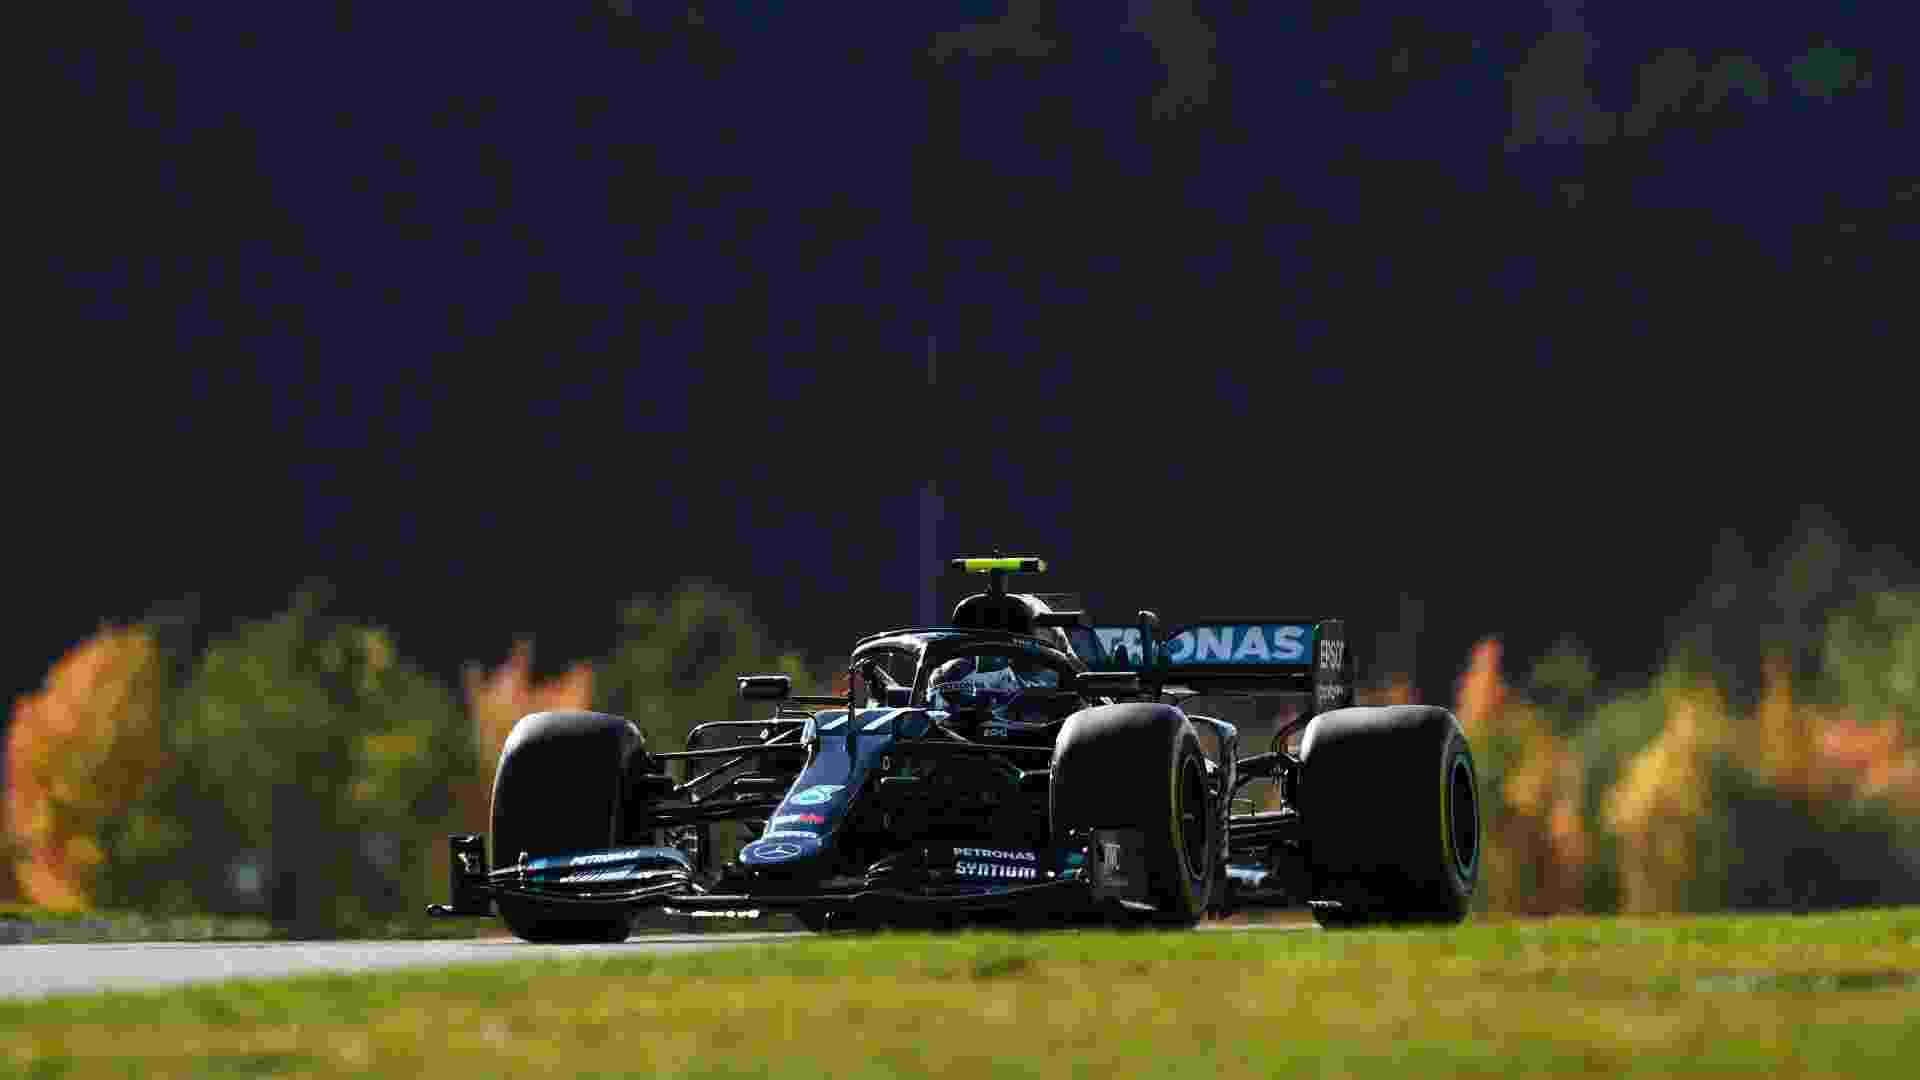 Valtteri Bottas durante o GP de Eifel - Clive Mason - Formula 1/Formula 1 via Getty Images